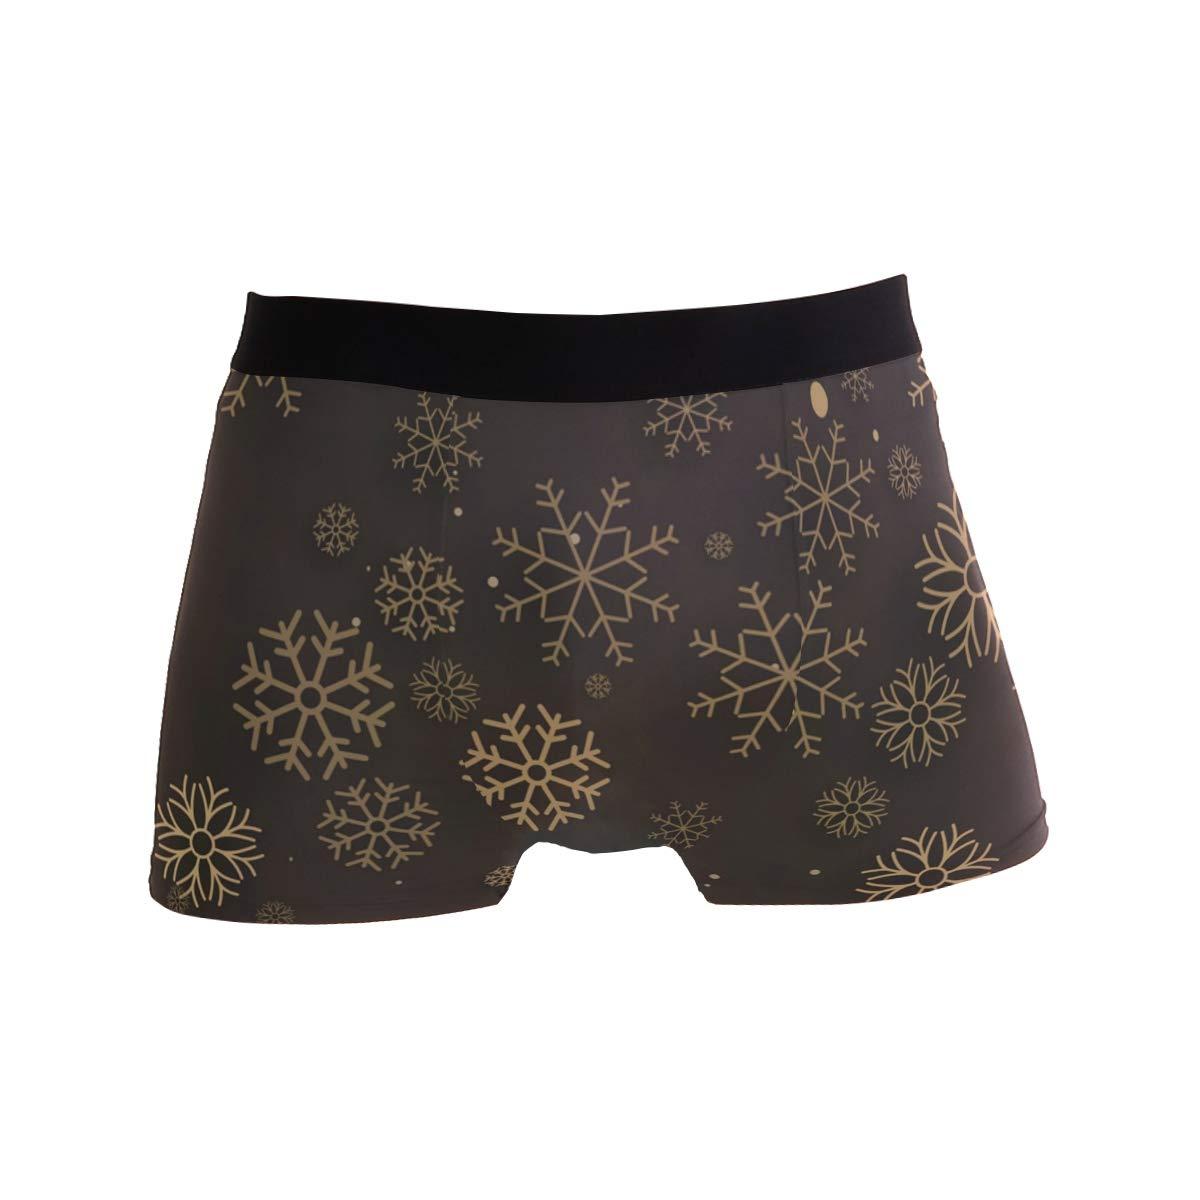 MAPOLO Christmas Golden Snowflake Underwear Mens Boxer Brief